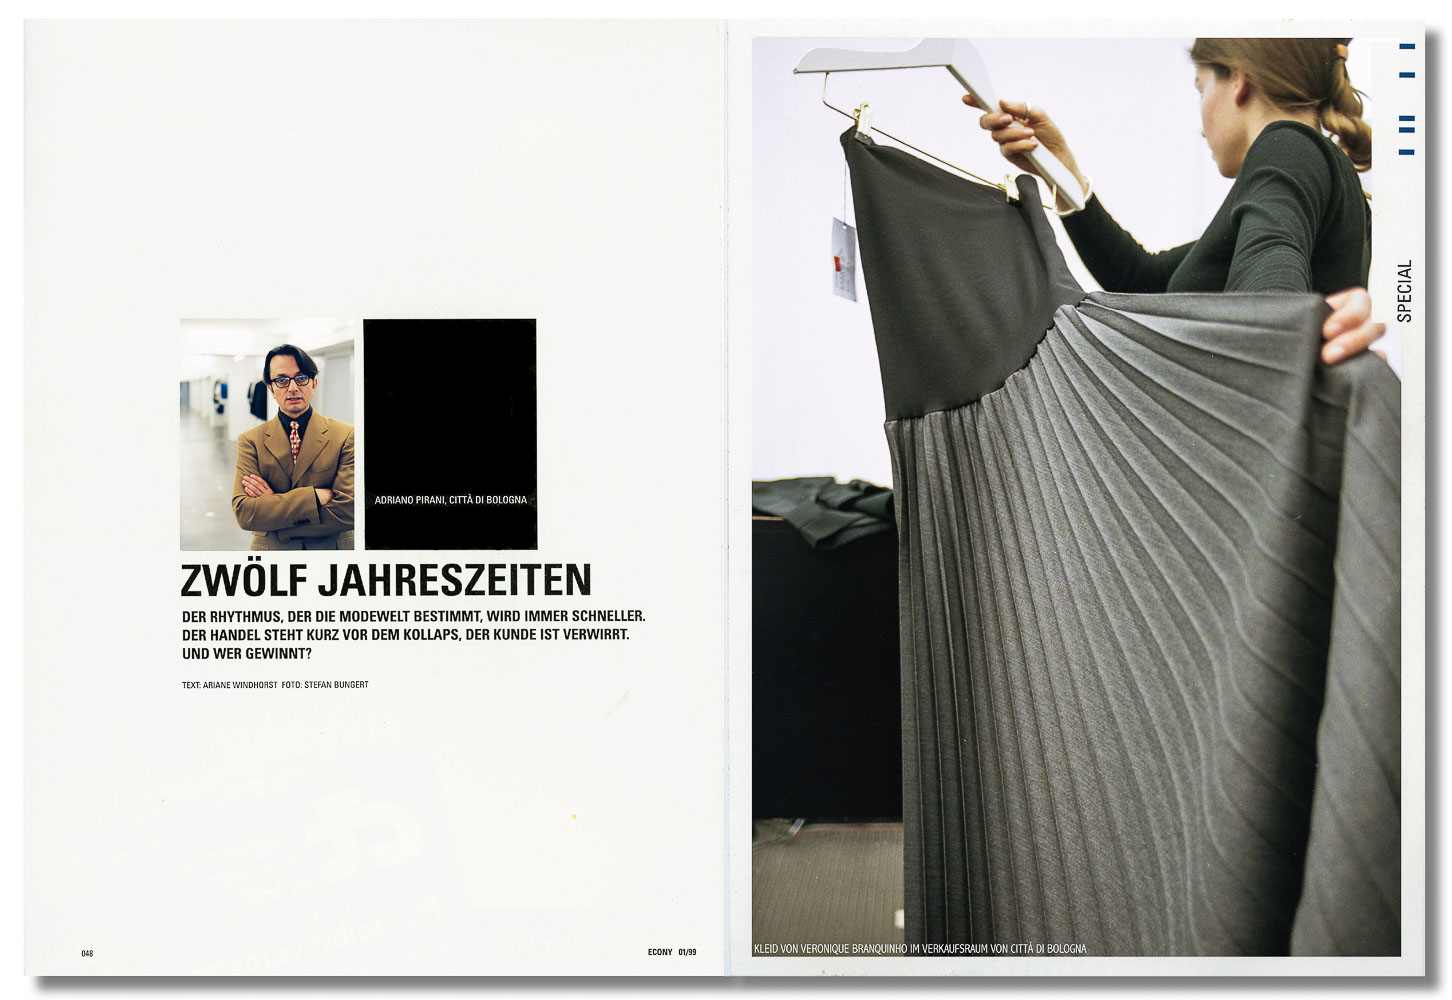 Econy Mode Stefan Bungert 2